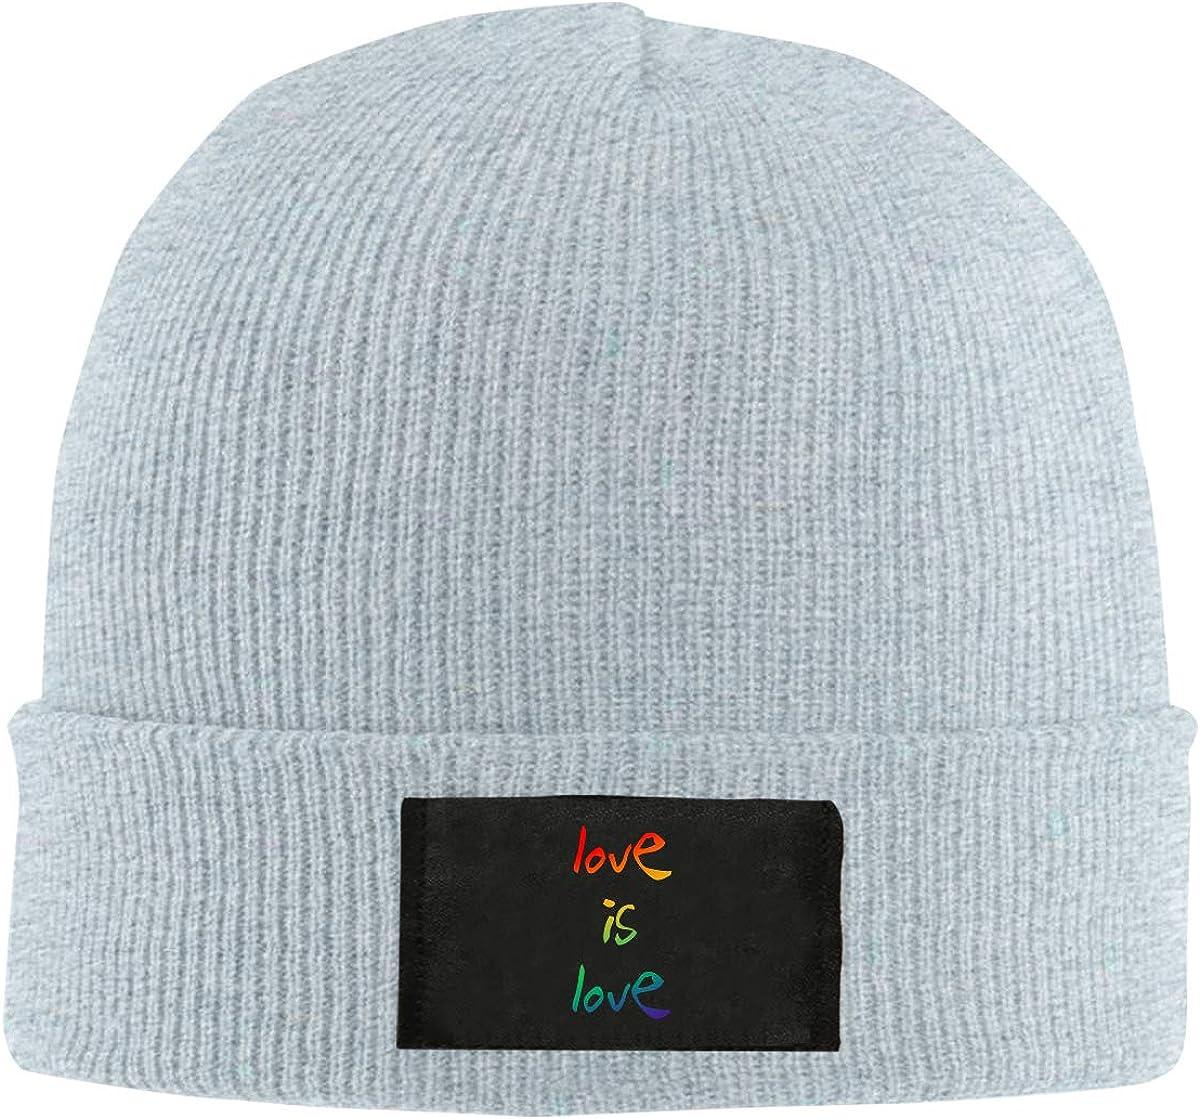 LRHUI Gay Winter Knitted Hat Warm Wool Skull Beanie Cap